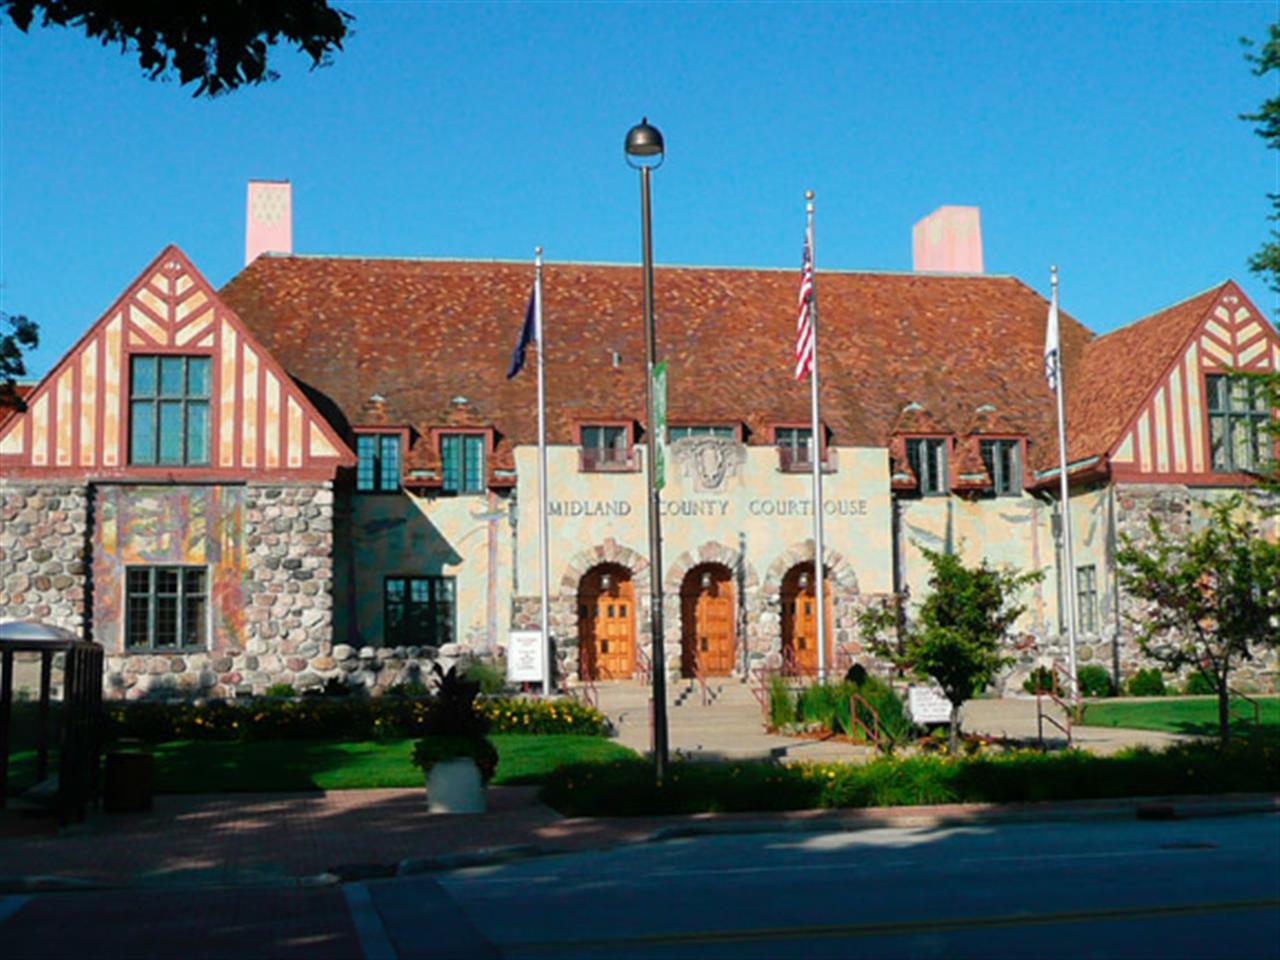 Midland County Courthouse, Midland, MI